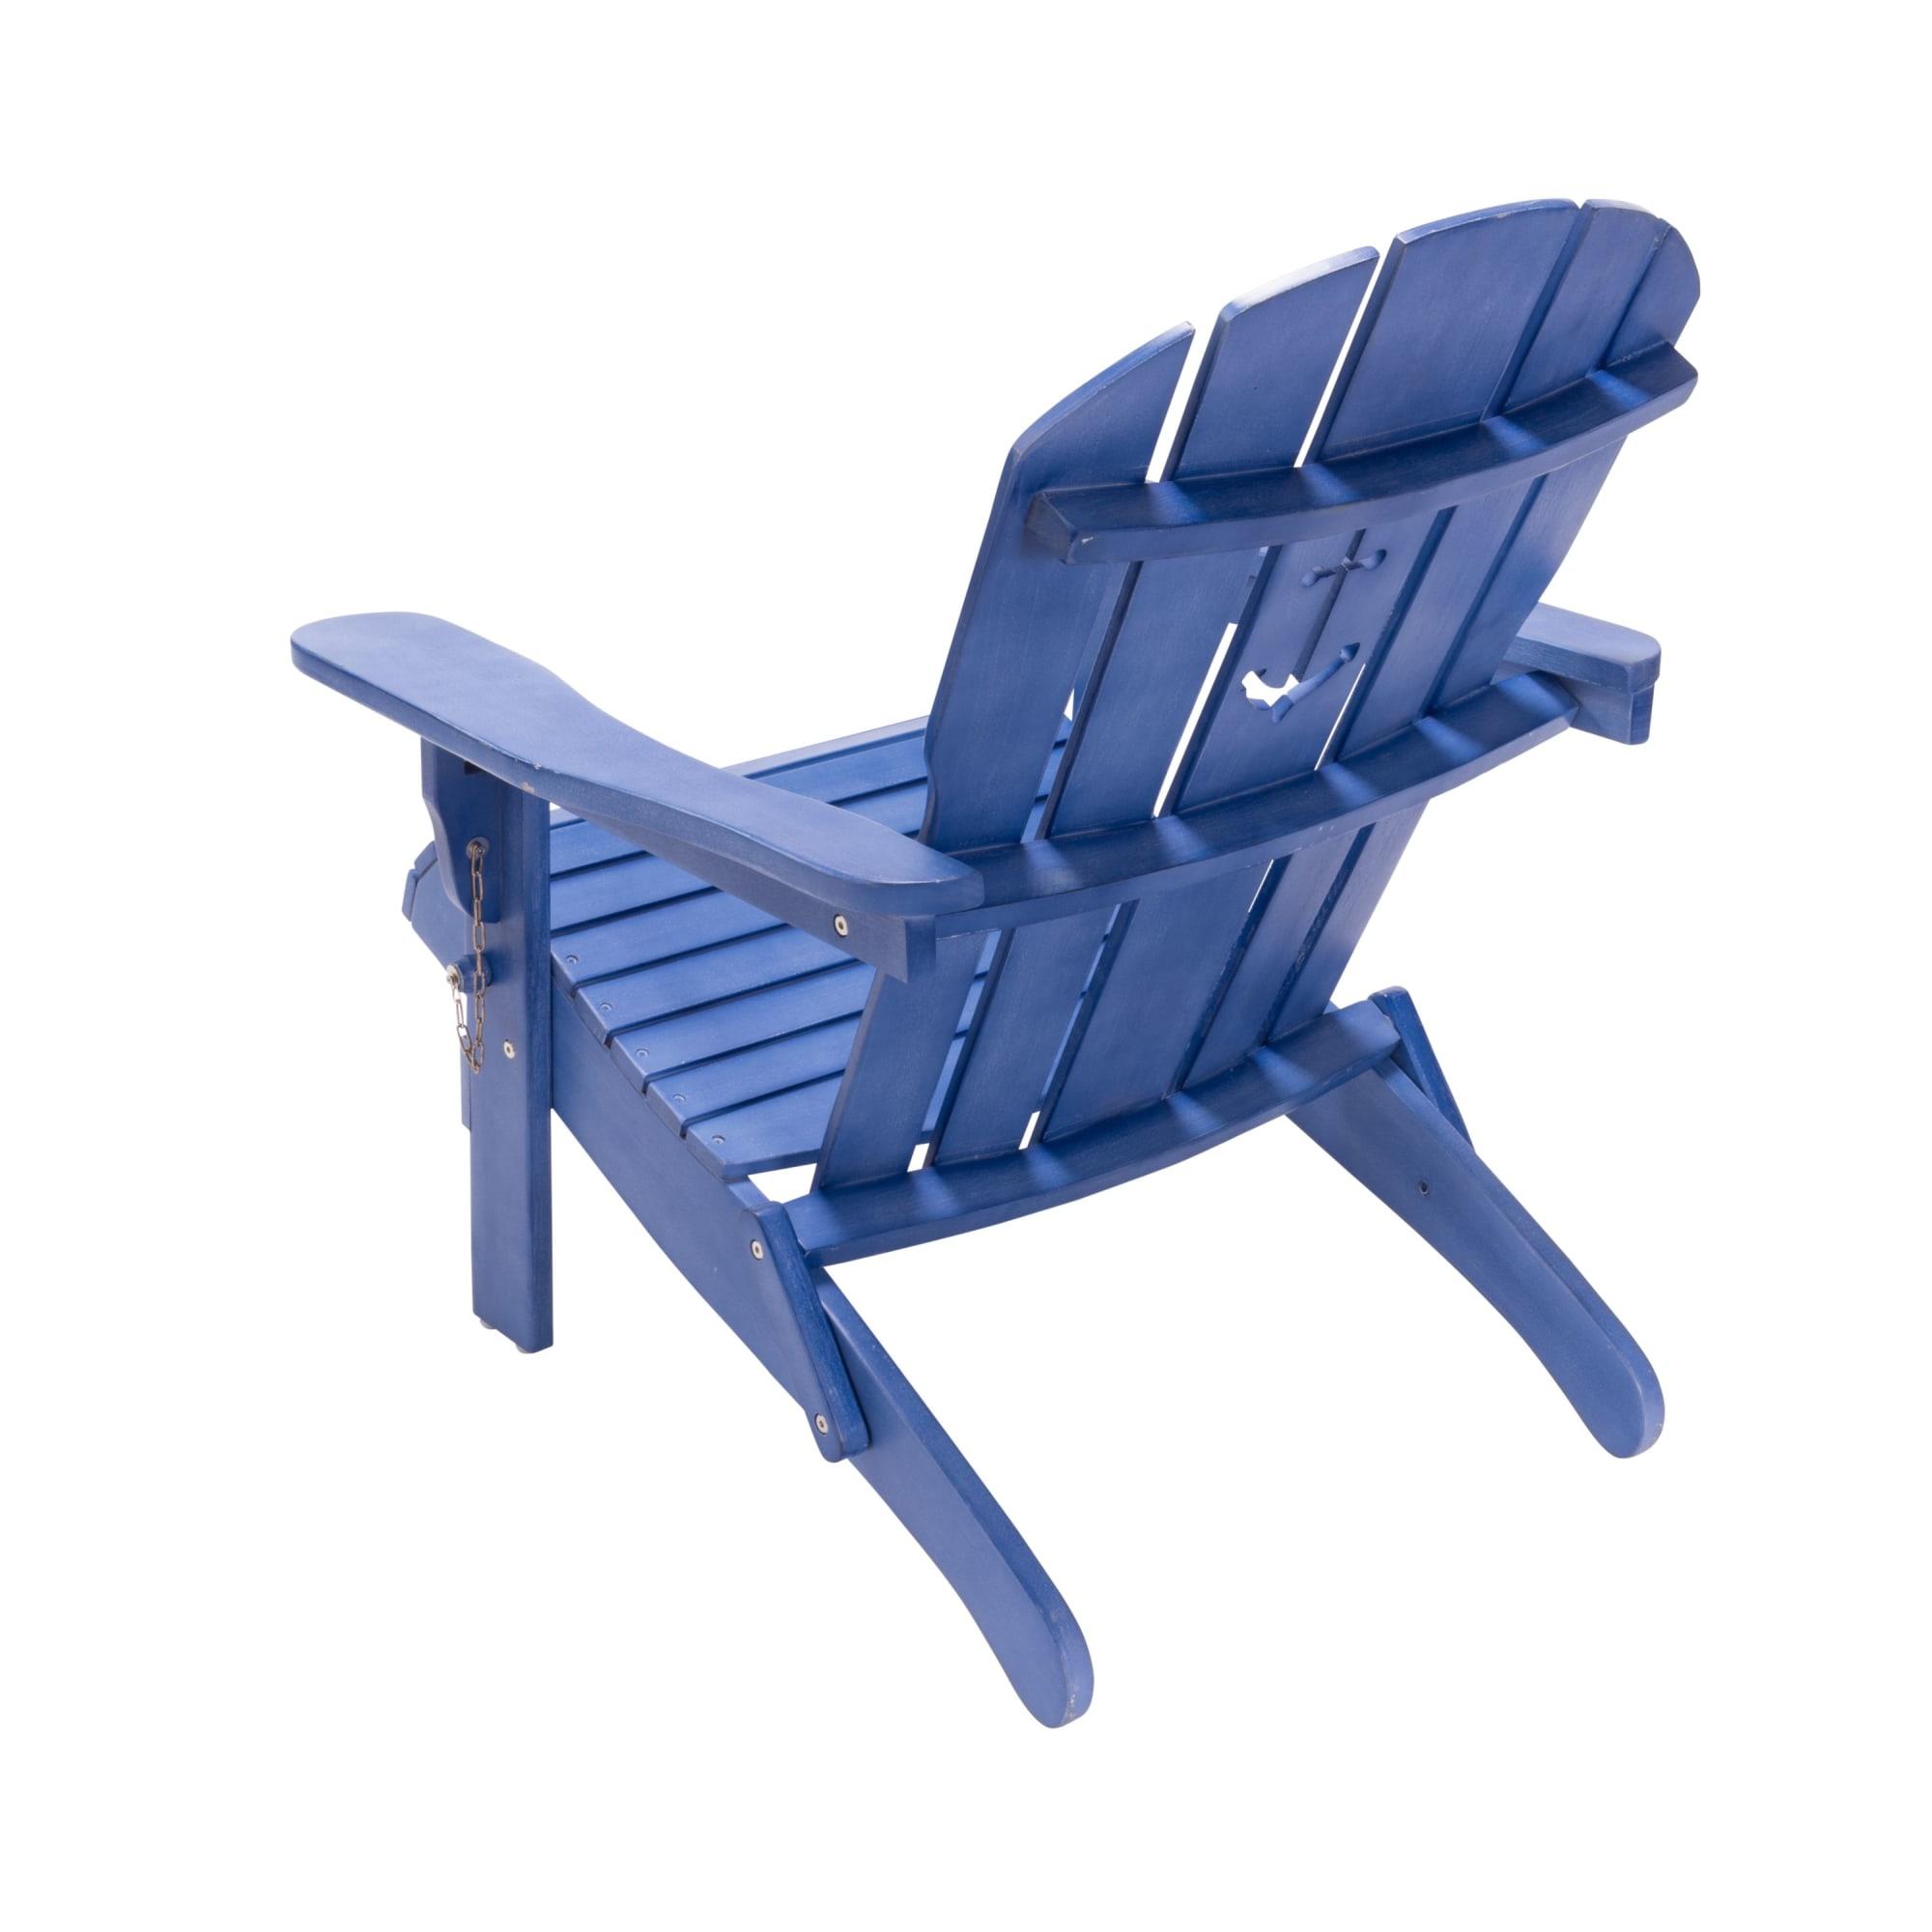 gartenstuhl hochlehner metall free gartenstuhl hochlehner kunststoff simple clp stapelstuhl air. Black Bedroom Furniture Sets. Home Design Ideas